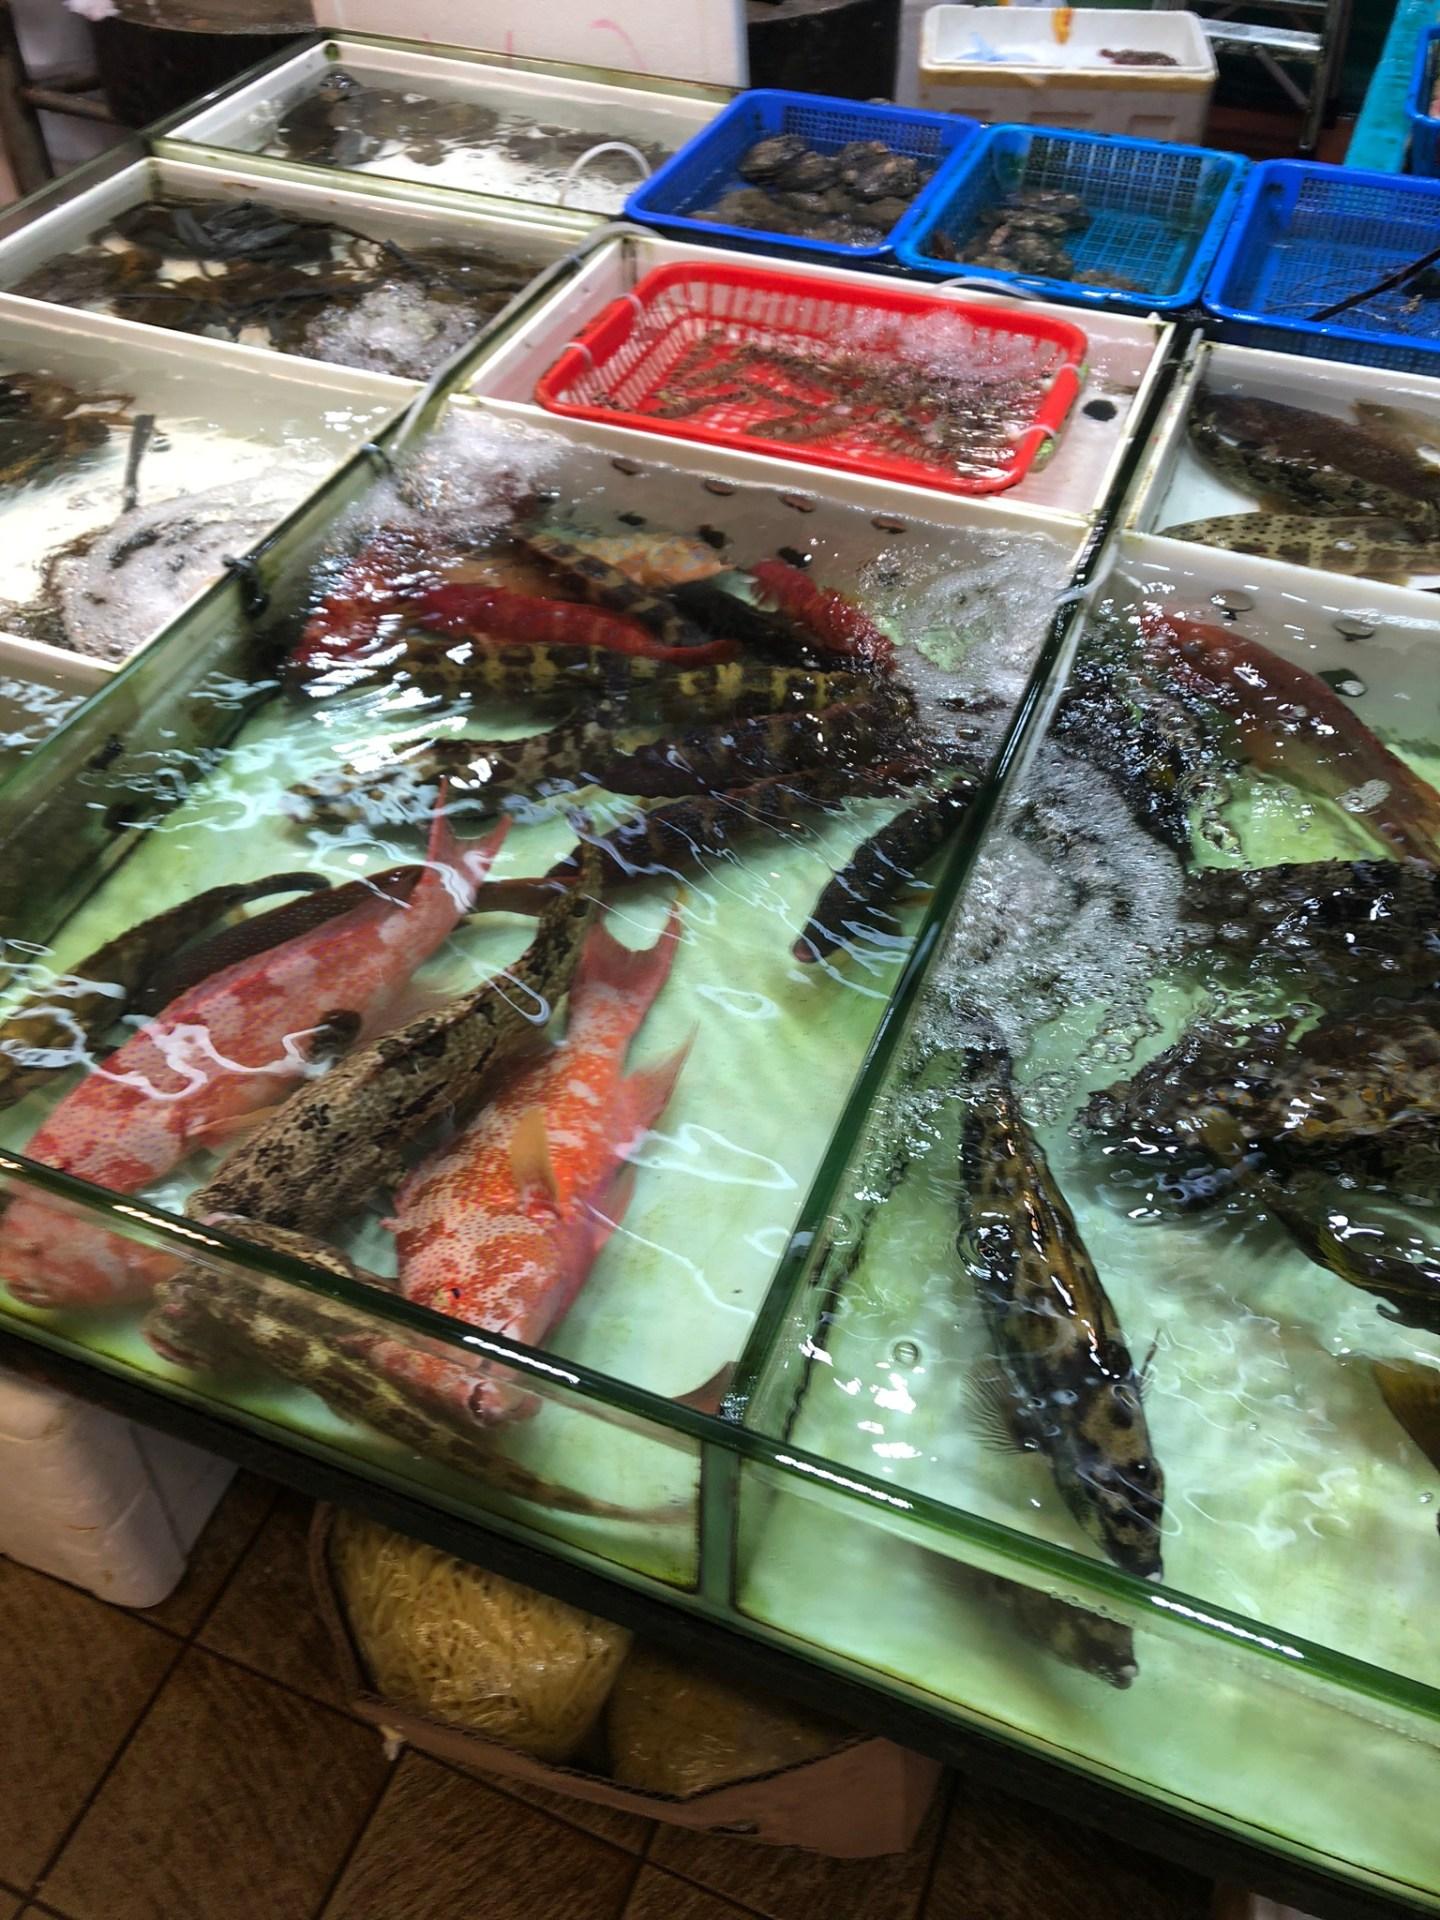 Fish for sale in Mong Kok, Hong Kong